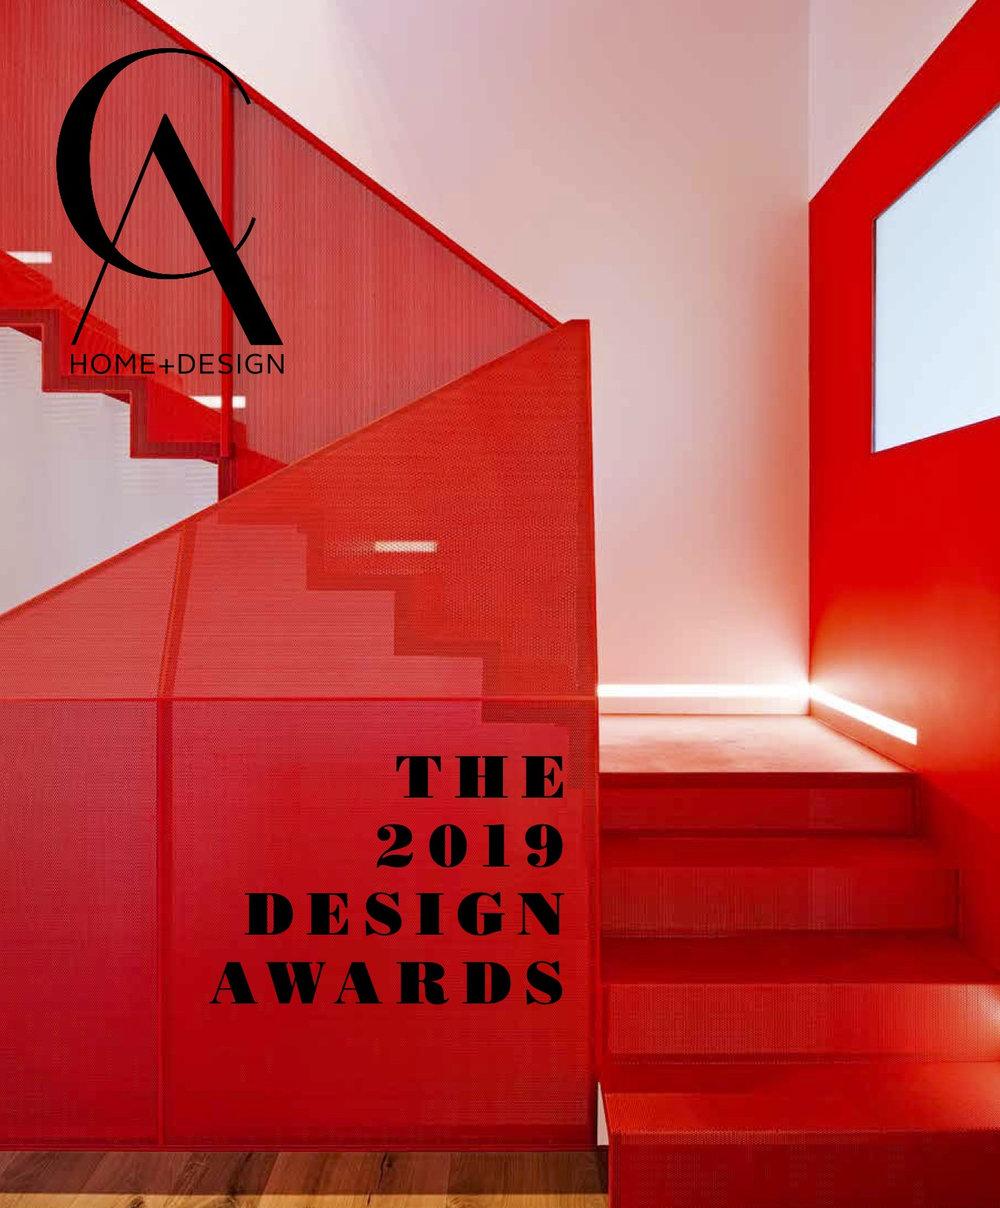 THE 2019 DESIGN AWARDS